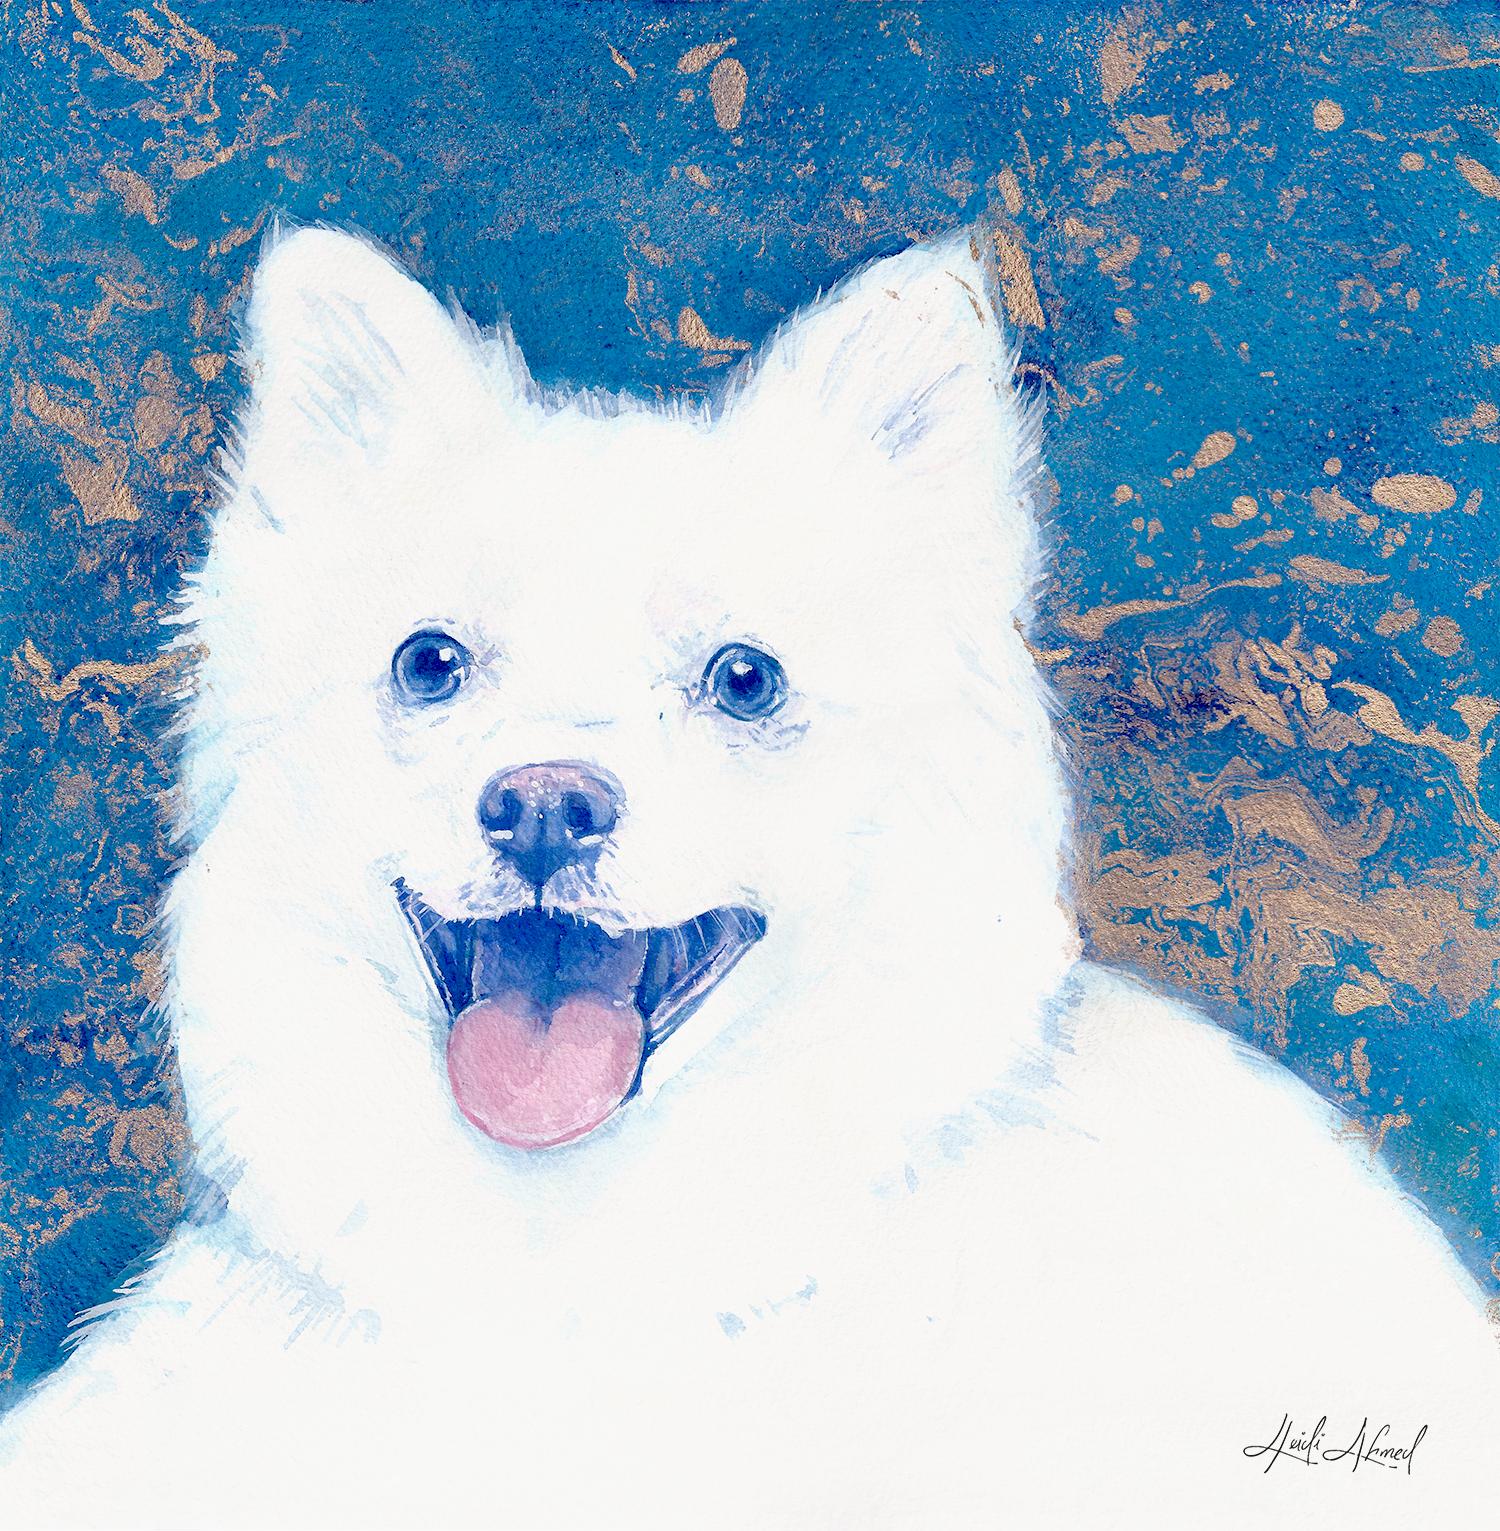 American-Eskimo-Dog-Portrait-Scan-Splice2.png